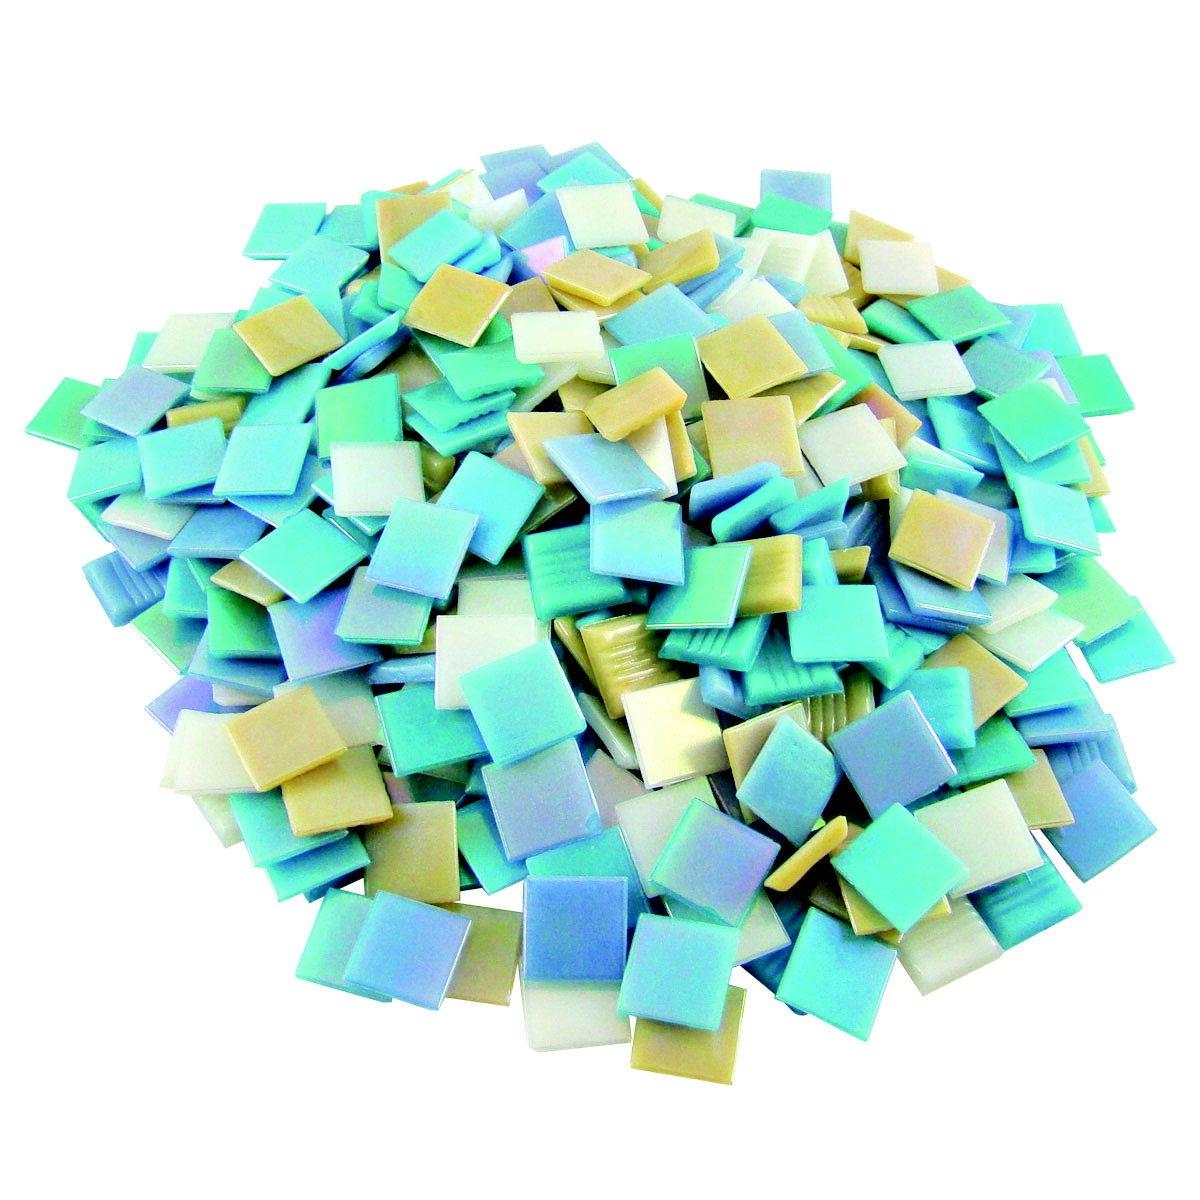 Jennifer's Mosaics Iridized Venetian Glass Tile Assortment, Assorted Colors, 3 Pounds